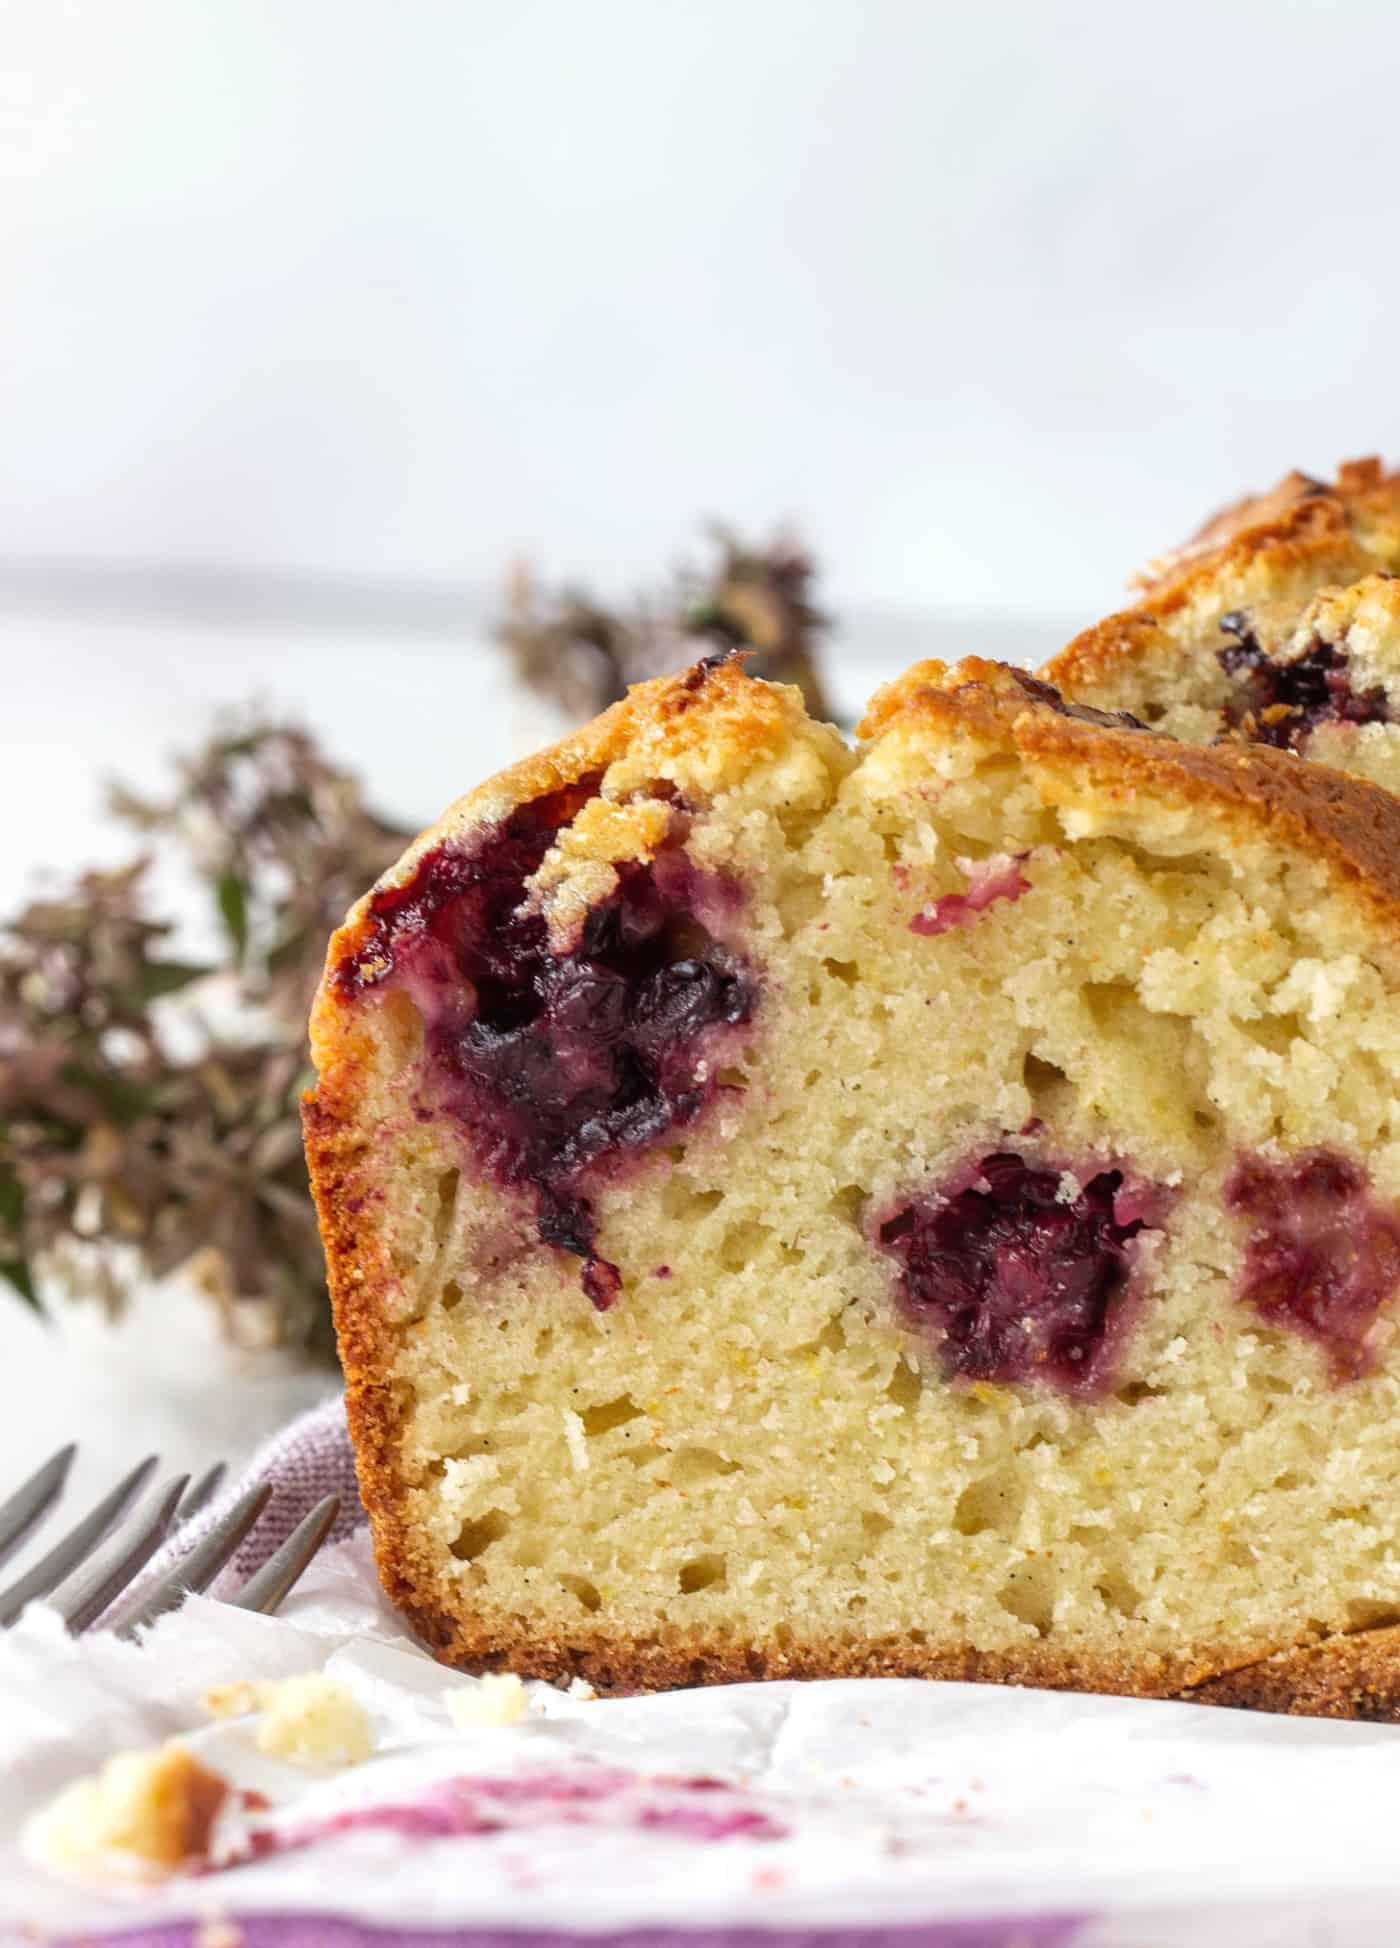 Orange blackberry muffin cake